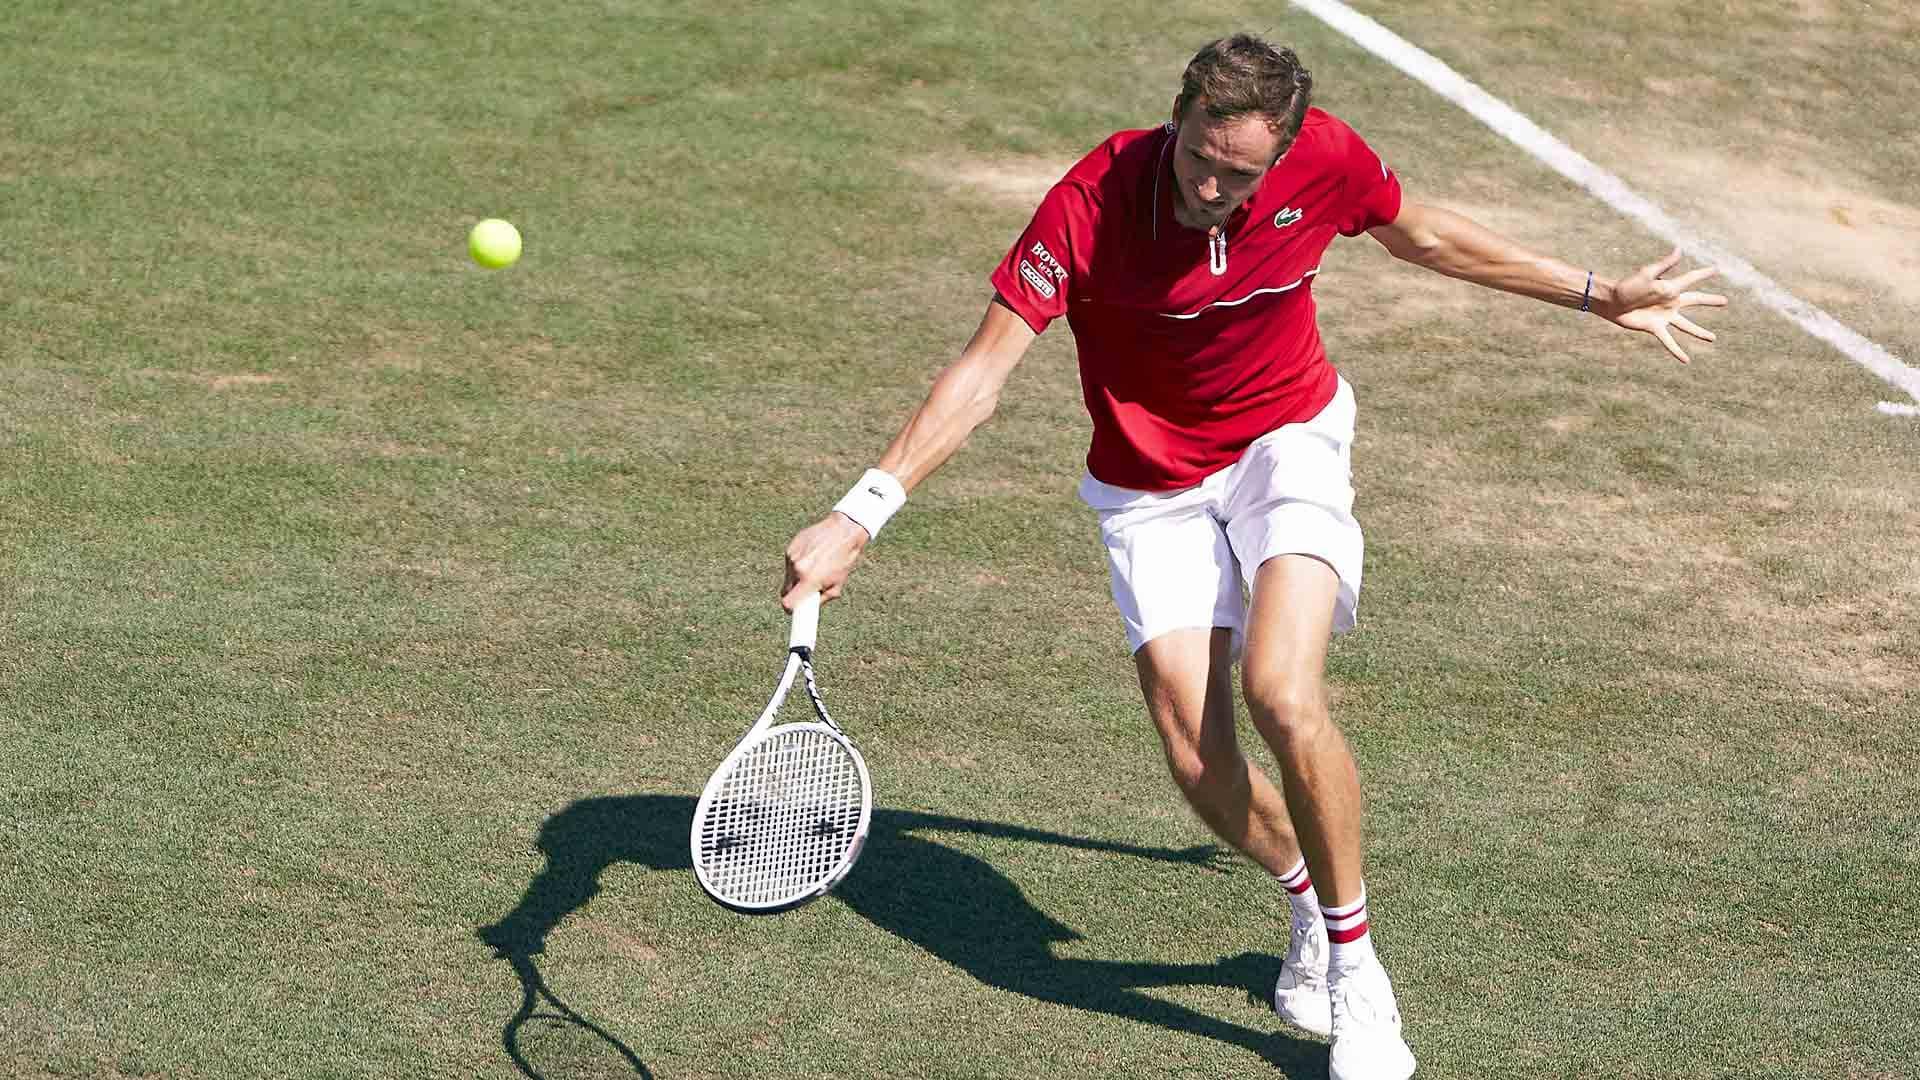 Mallorca Open 2021: Daniil Medvedev vs. Casper Ruud Tennis Pick and Prediction